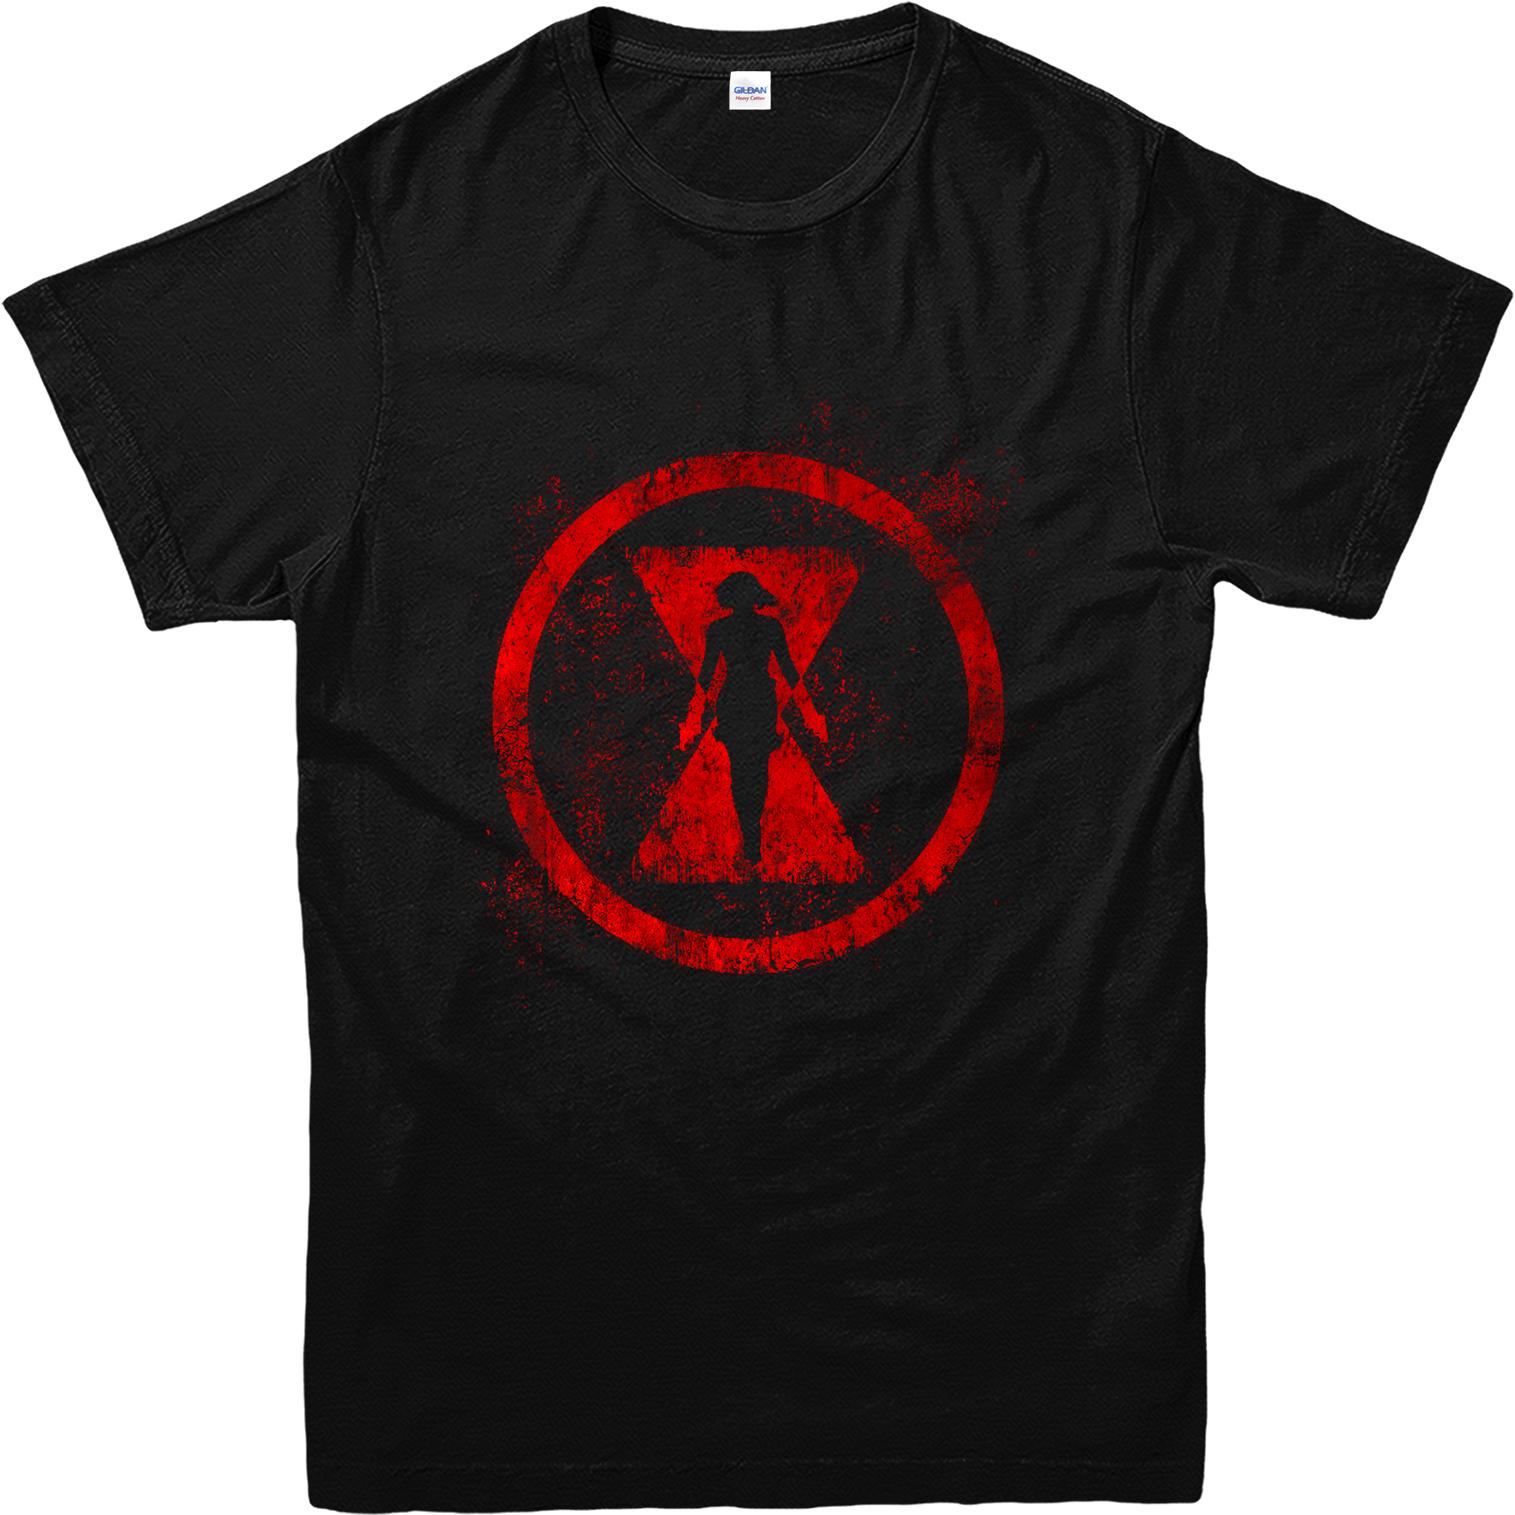 Black Widow T Shirt Avengers Marvel Comics Inspired